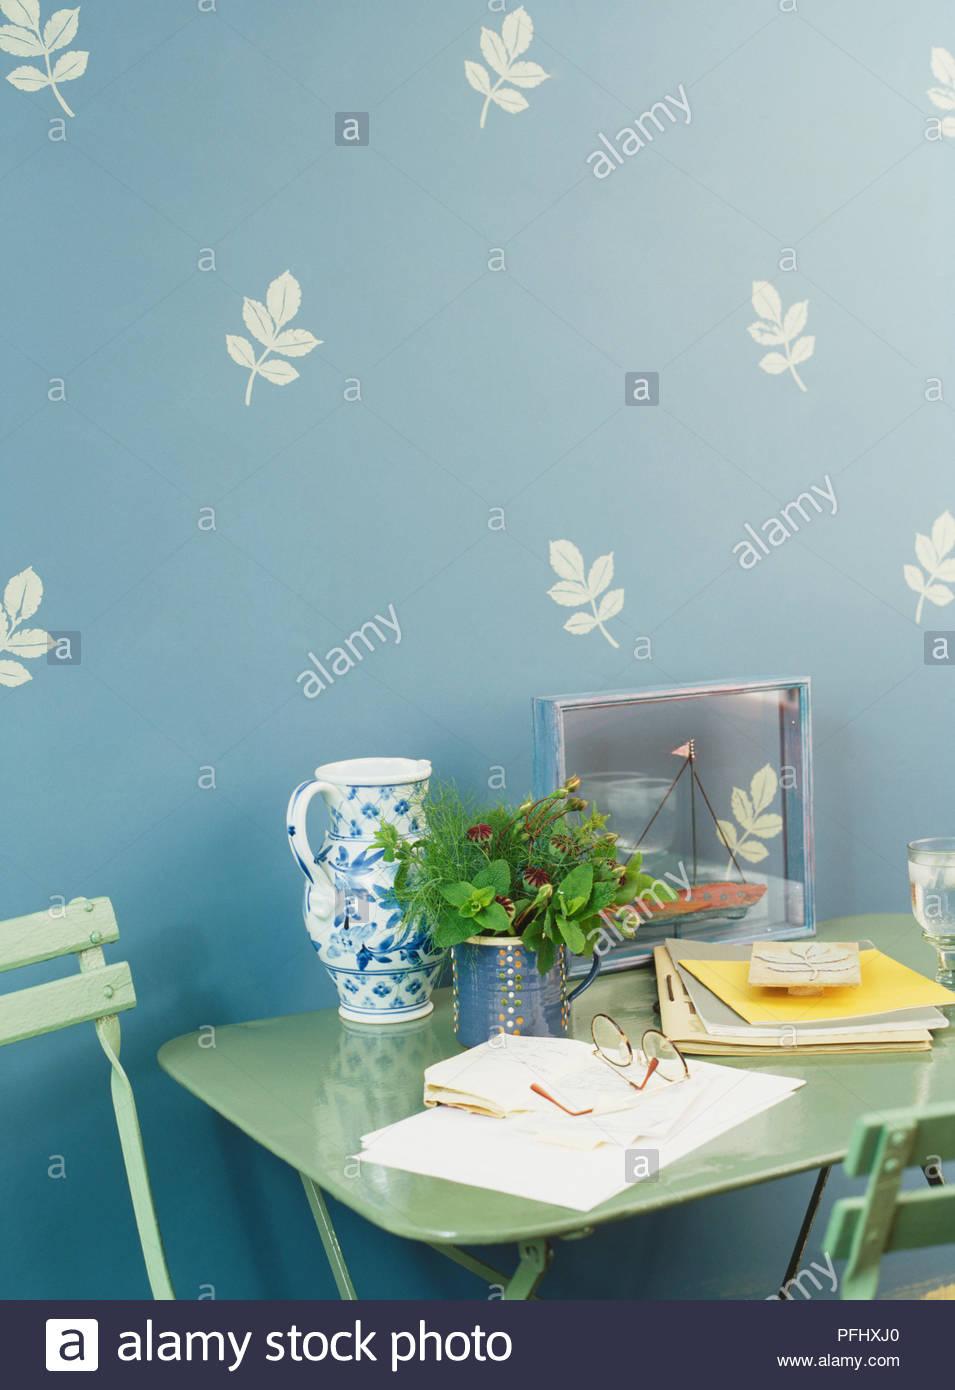 Patterened Wallpaper Stock Photos Patterened Wallpaper Stock 955x1390